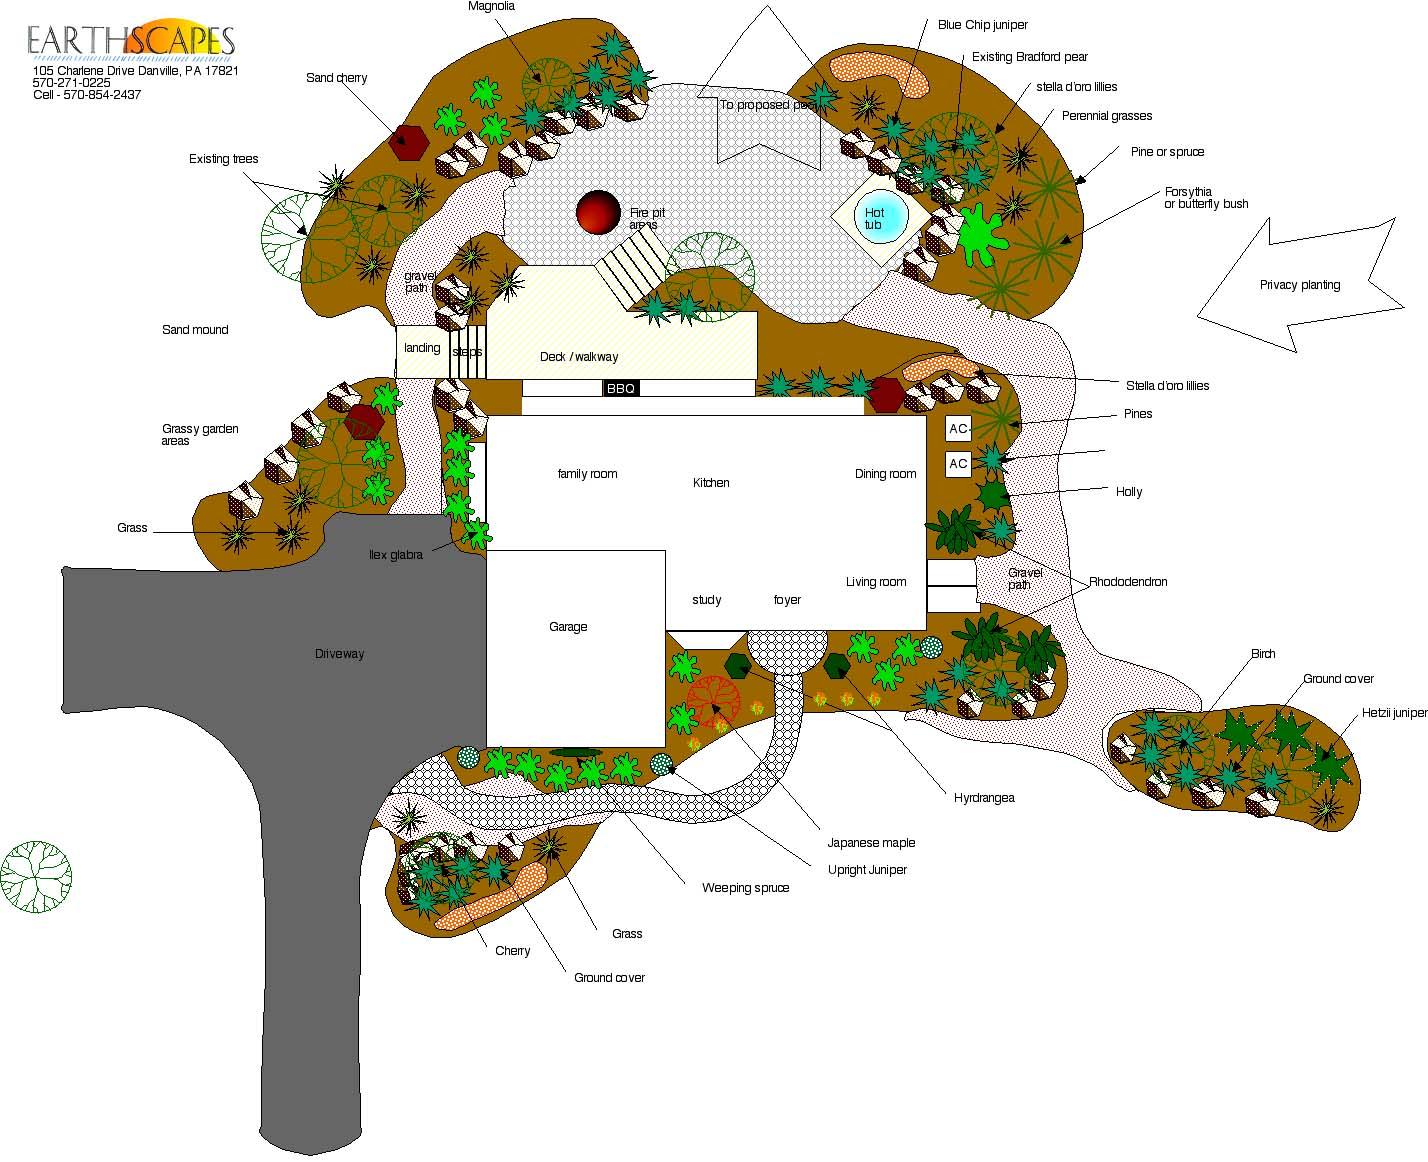 Landsape concept drawing